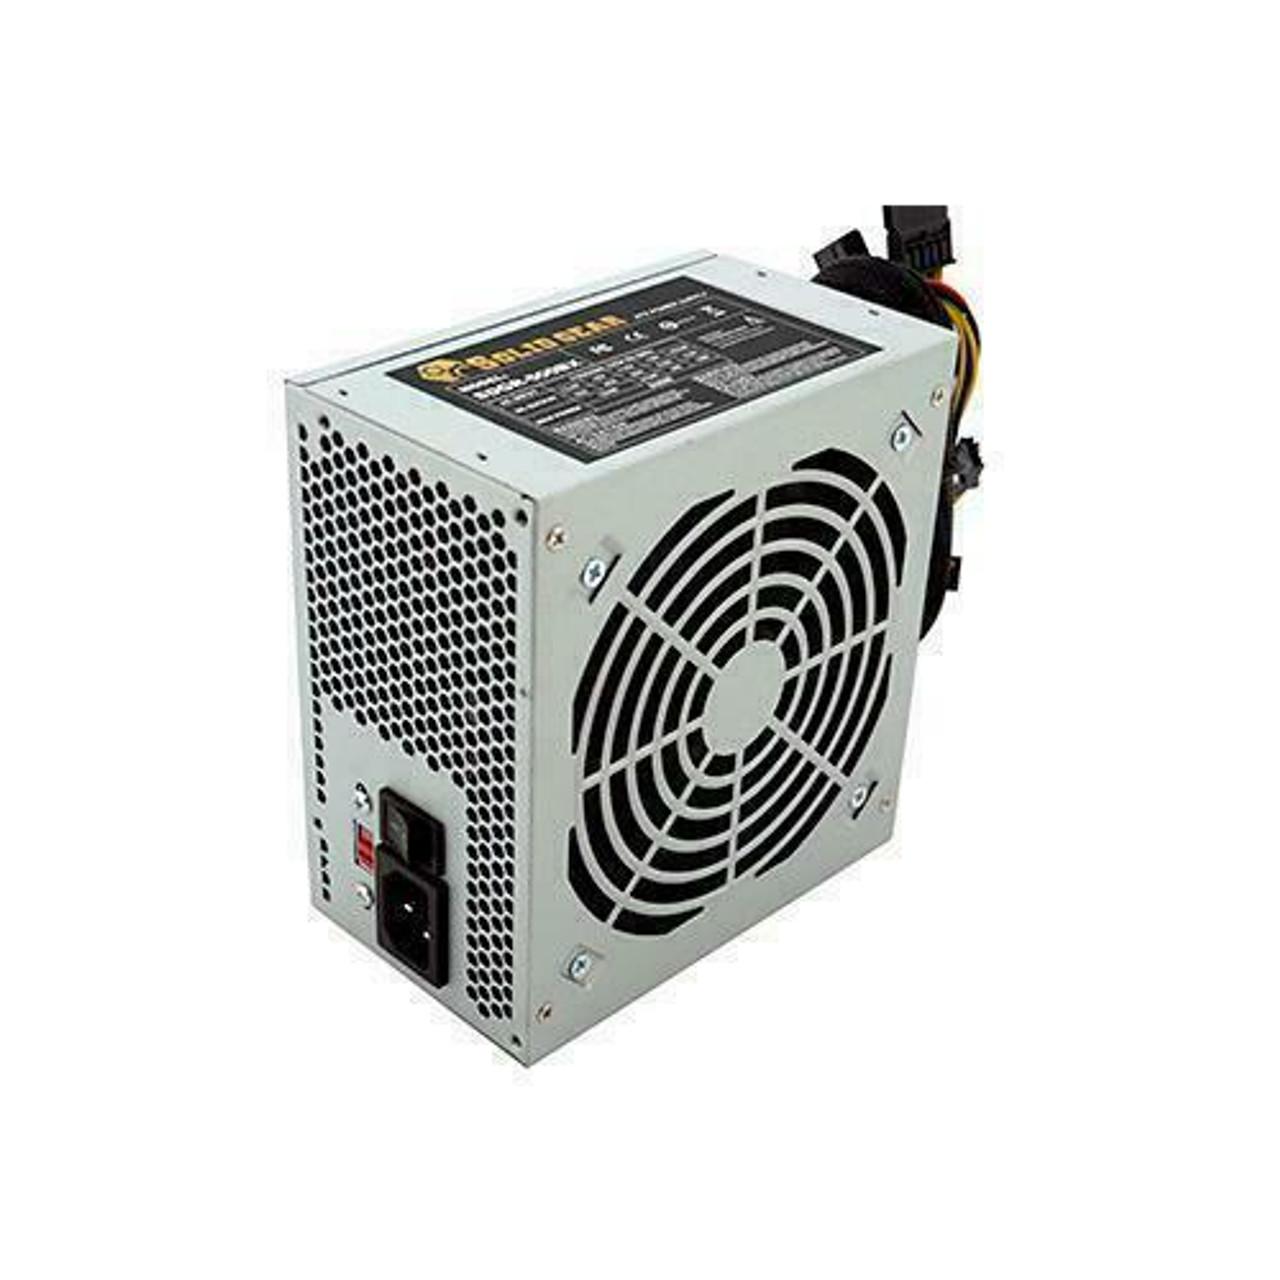 Solid Gear SDGR-500BX 500W ATX Non-Modular Power Supply